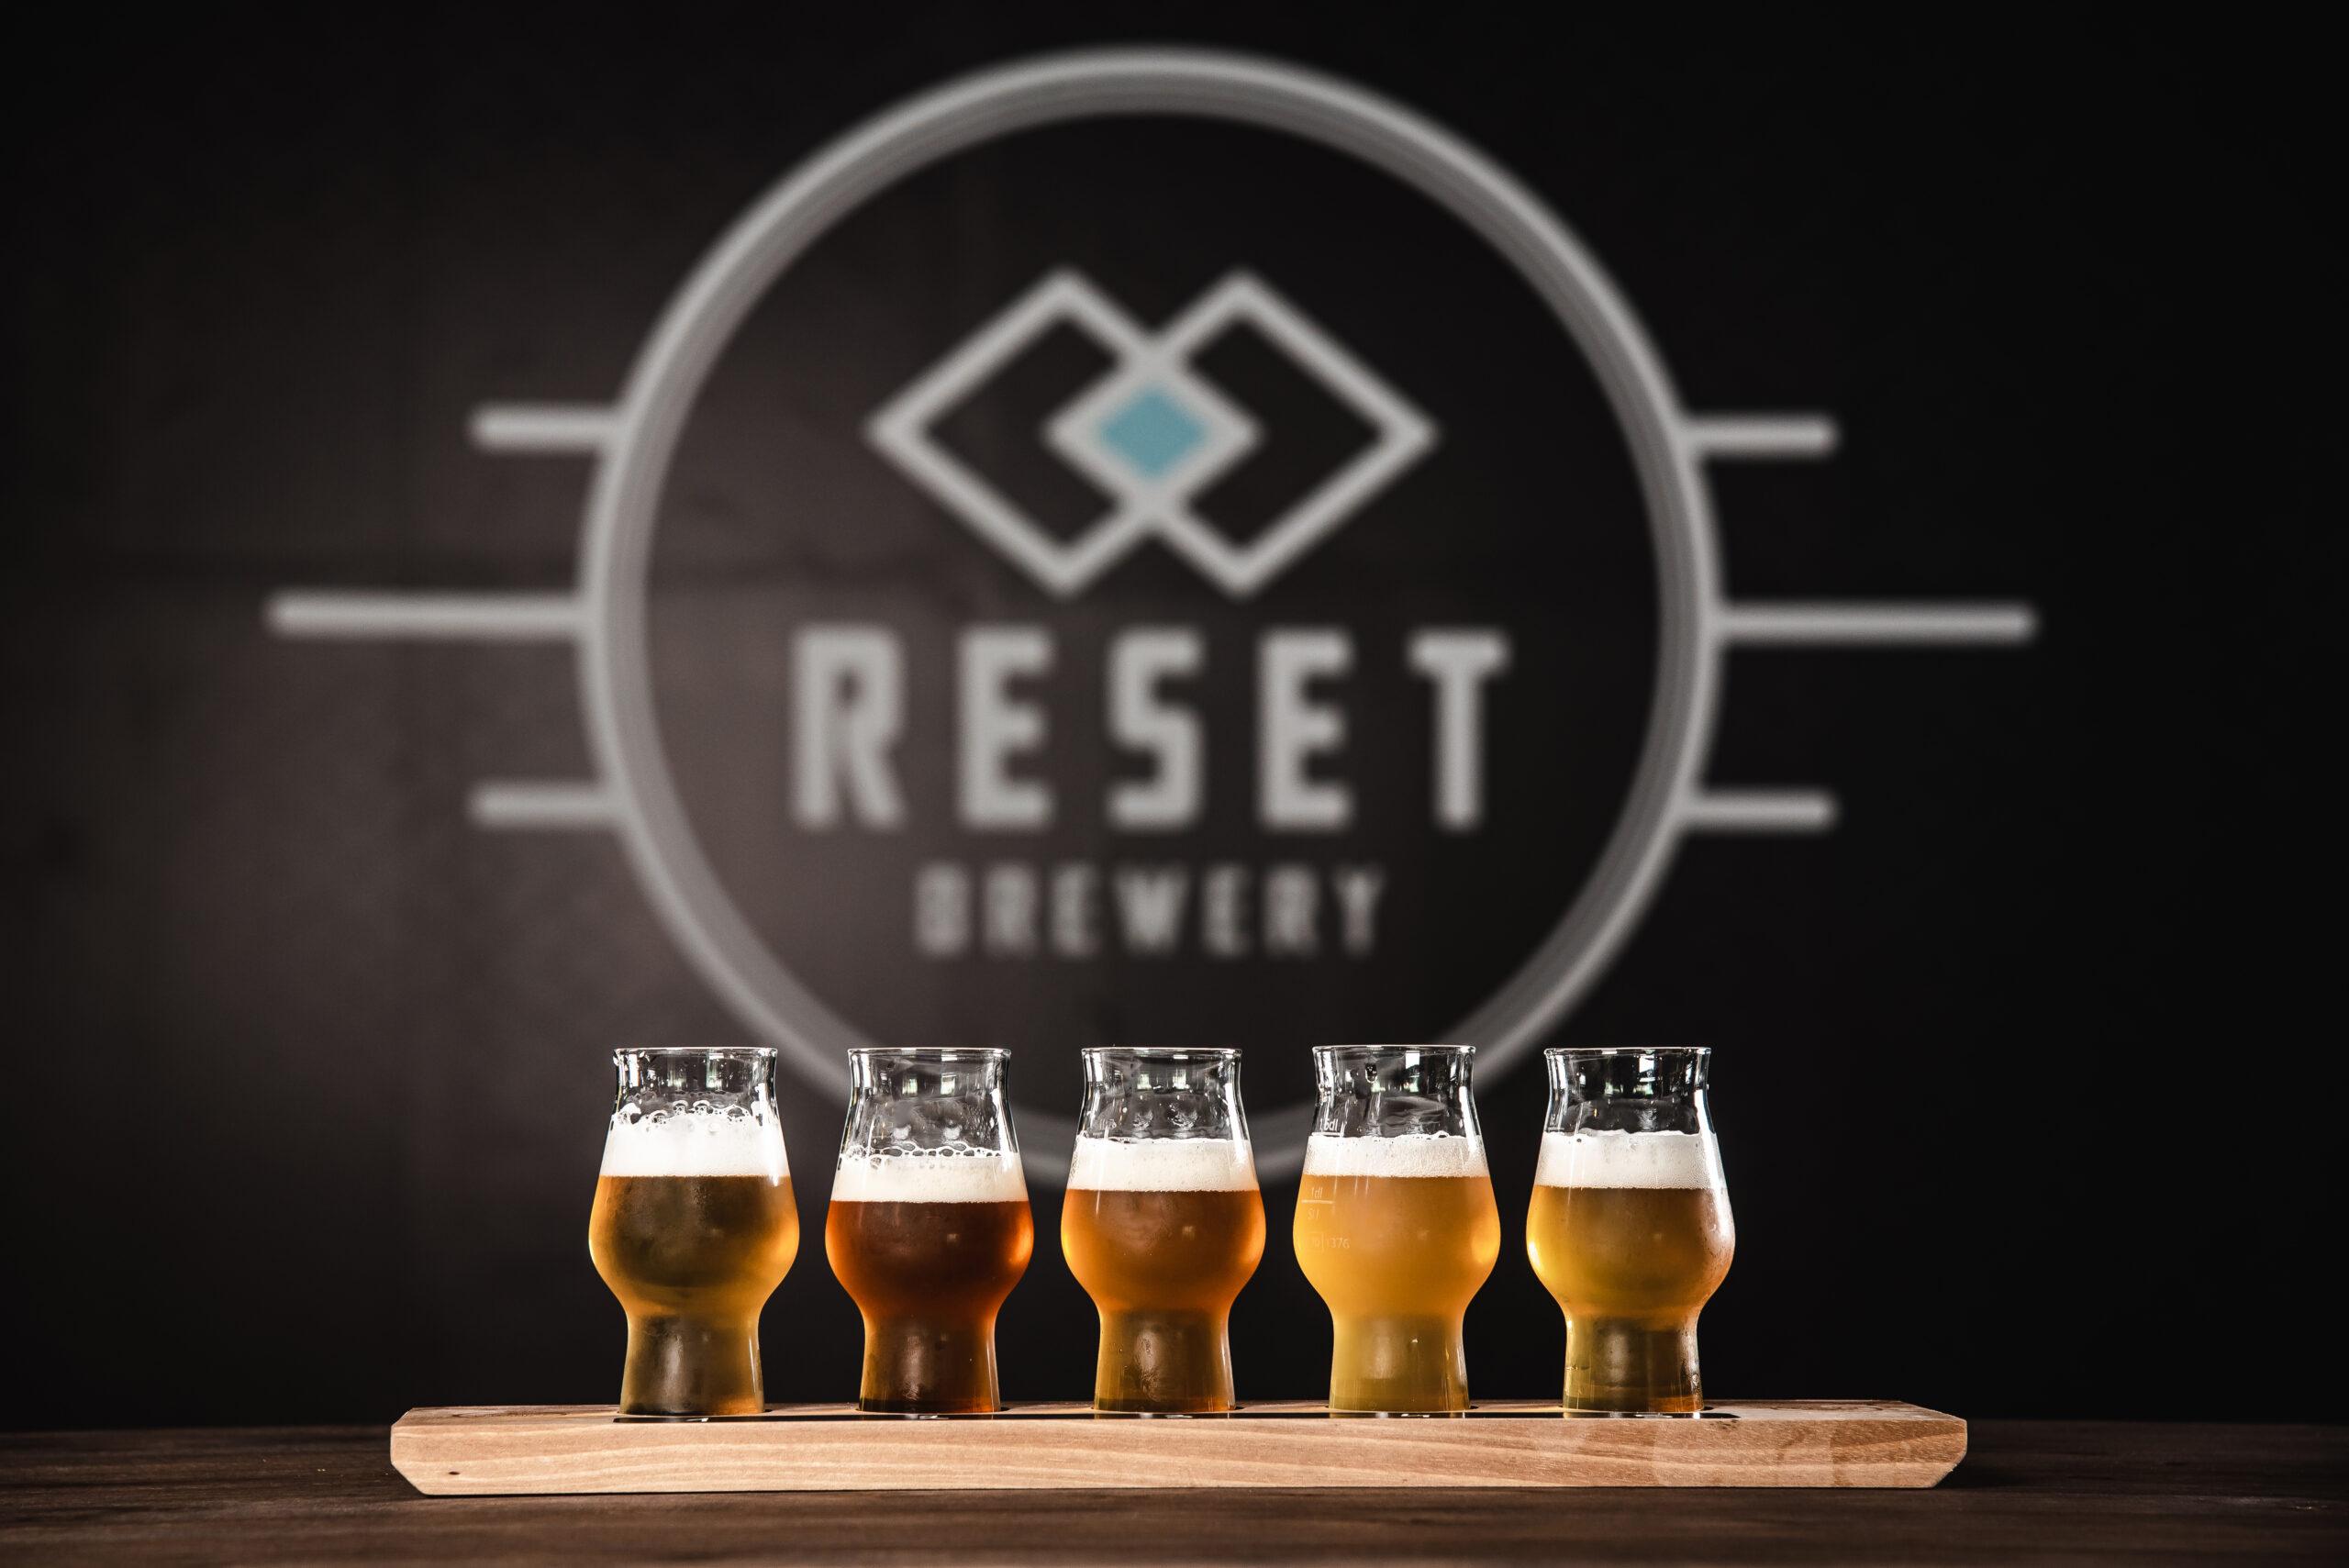 Reset pivovarna product-19